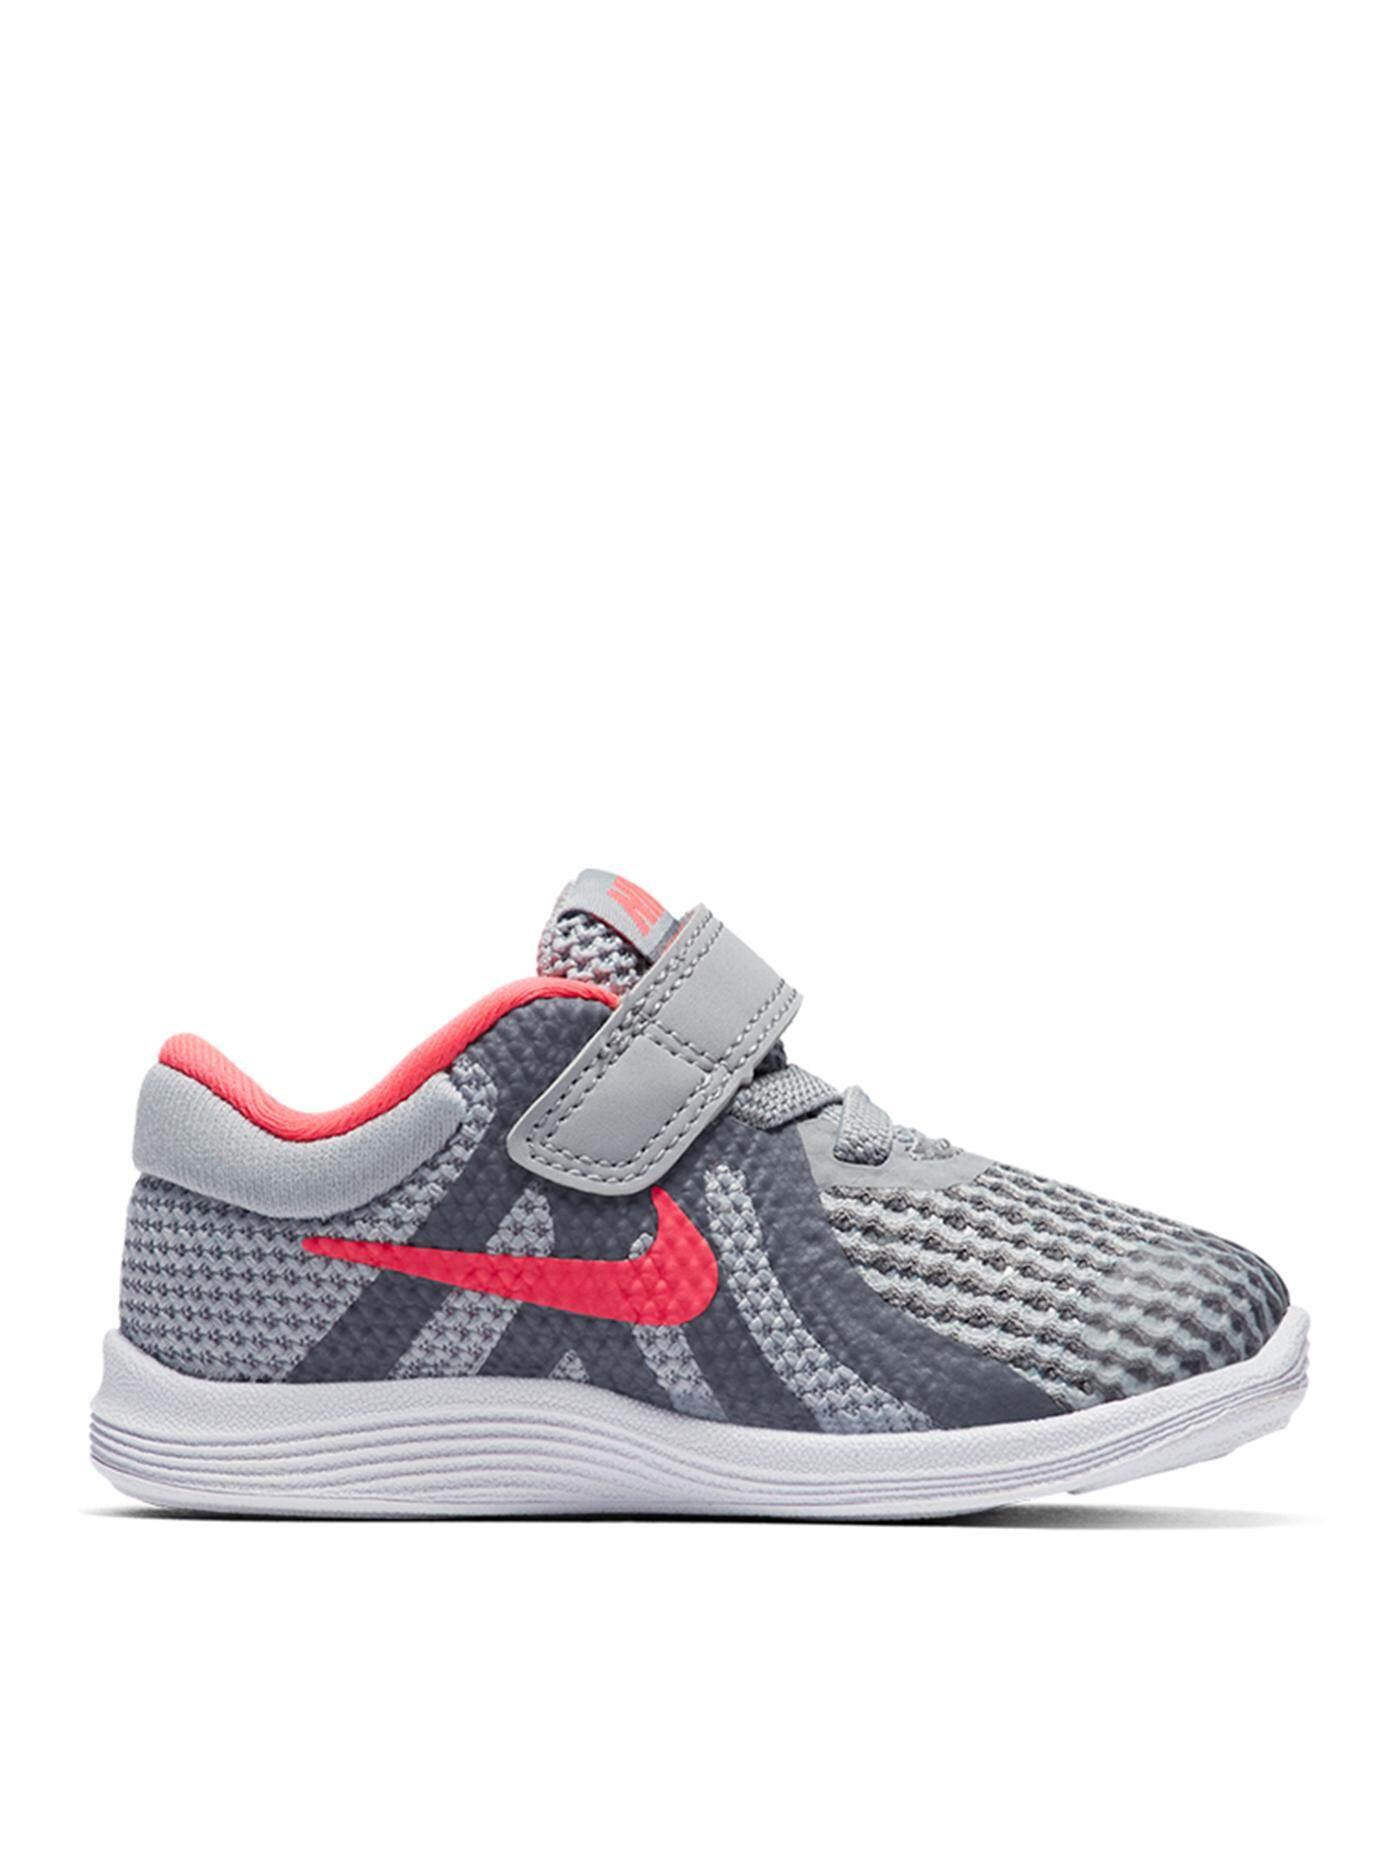 8b569d364bae6 NIKE รองเท้าวิ่งเด็กผู้หญิง Revolution 4 (TDV) 943308-003 ไซส์ US9C สีWolf  Grey-Racer Pink-Cool Grey-White